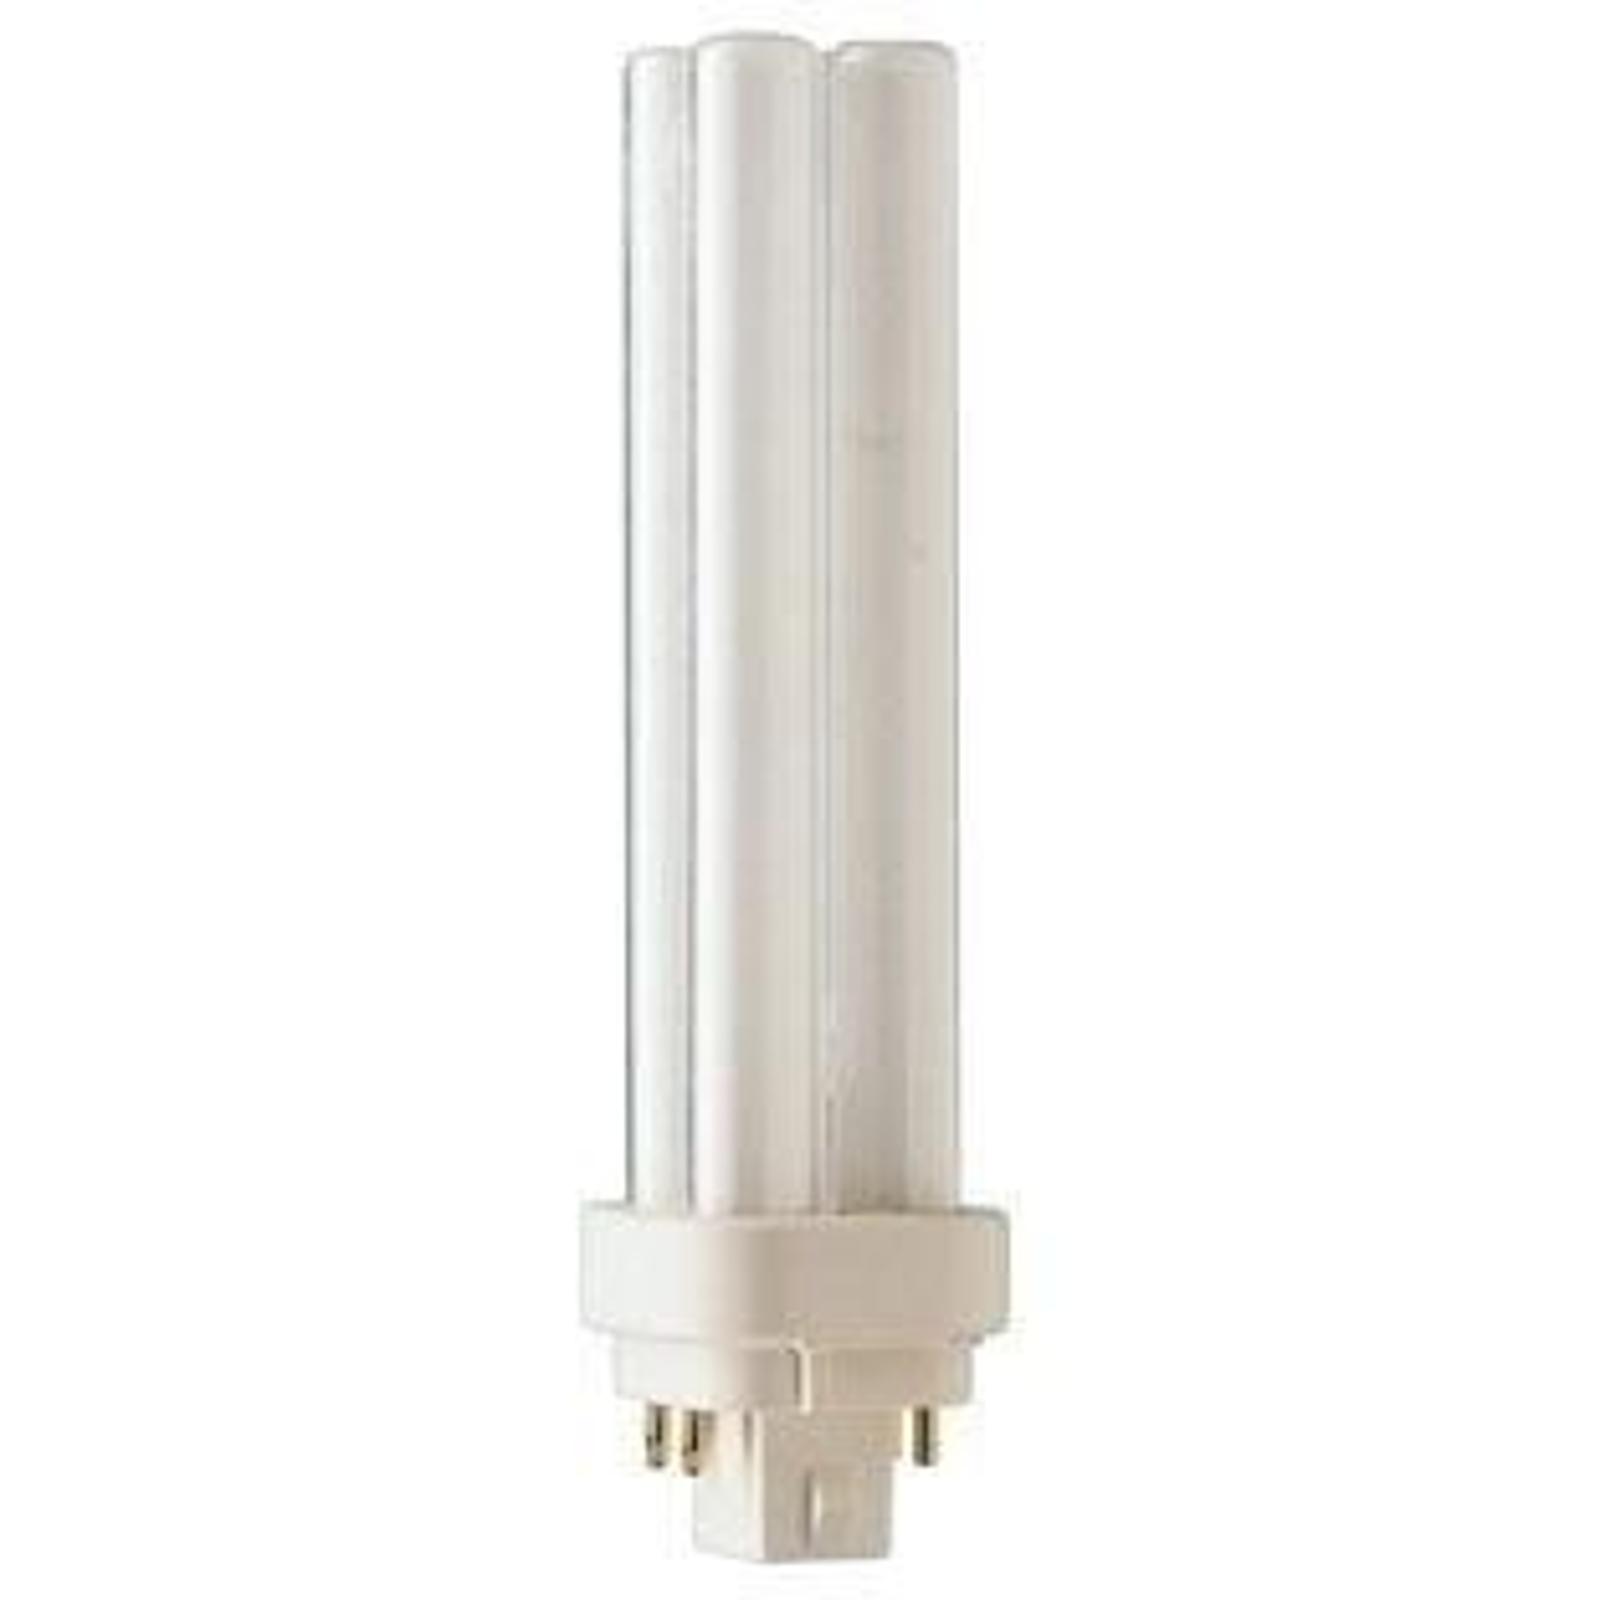 G24q 18W 830 Kompaktleuchtstofflampe DULUX D/E